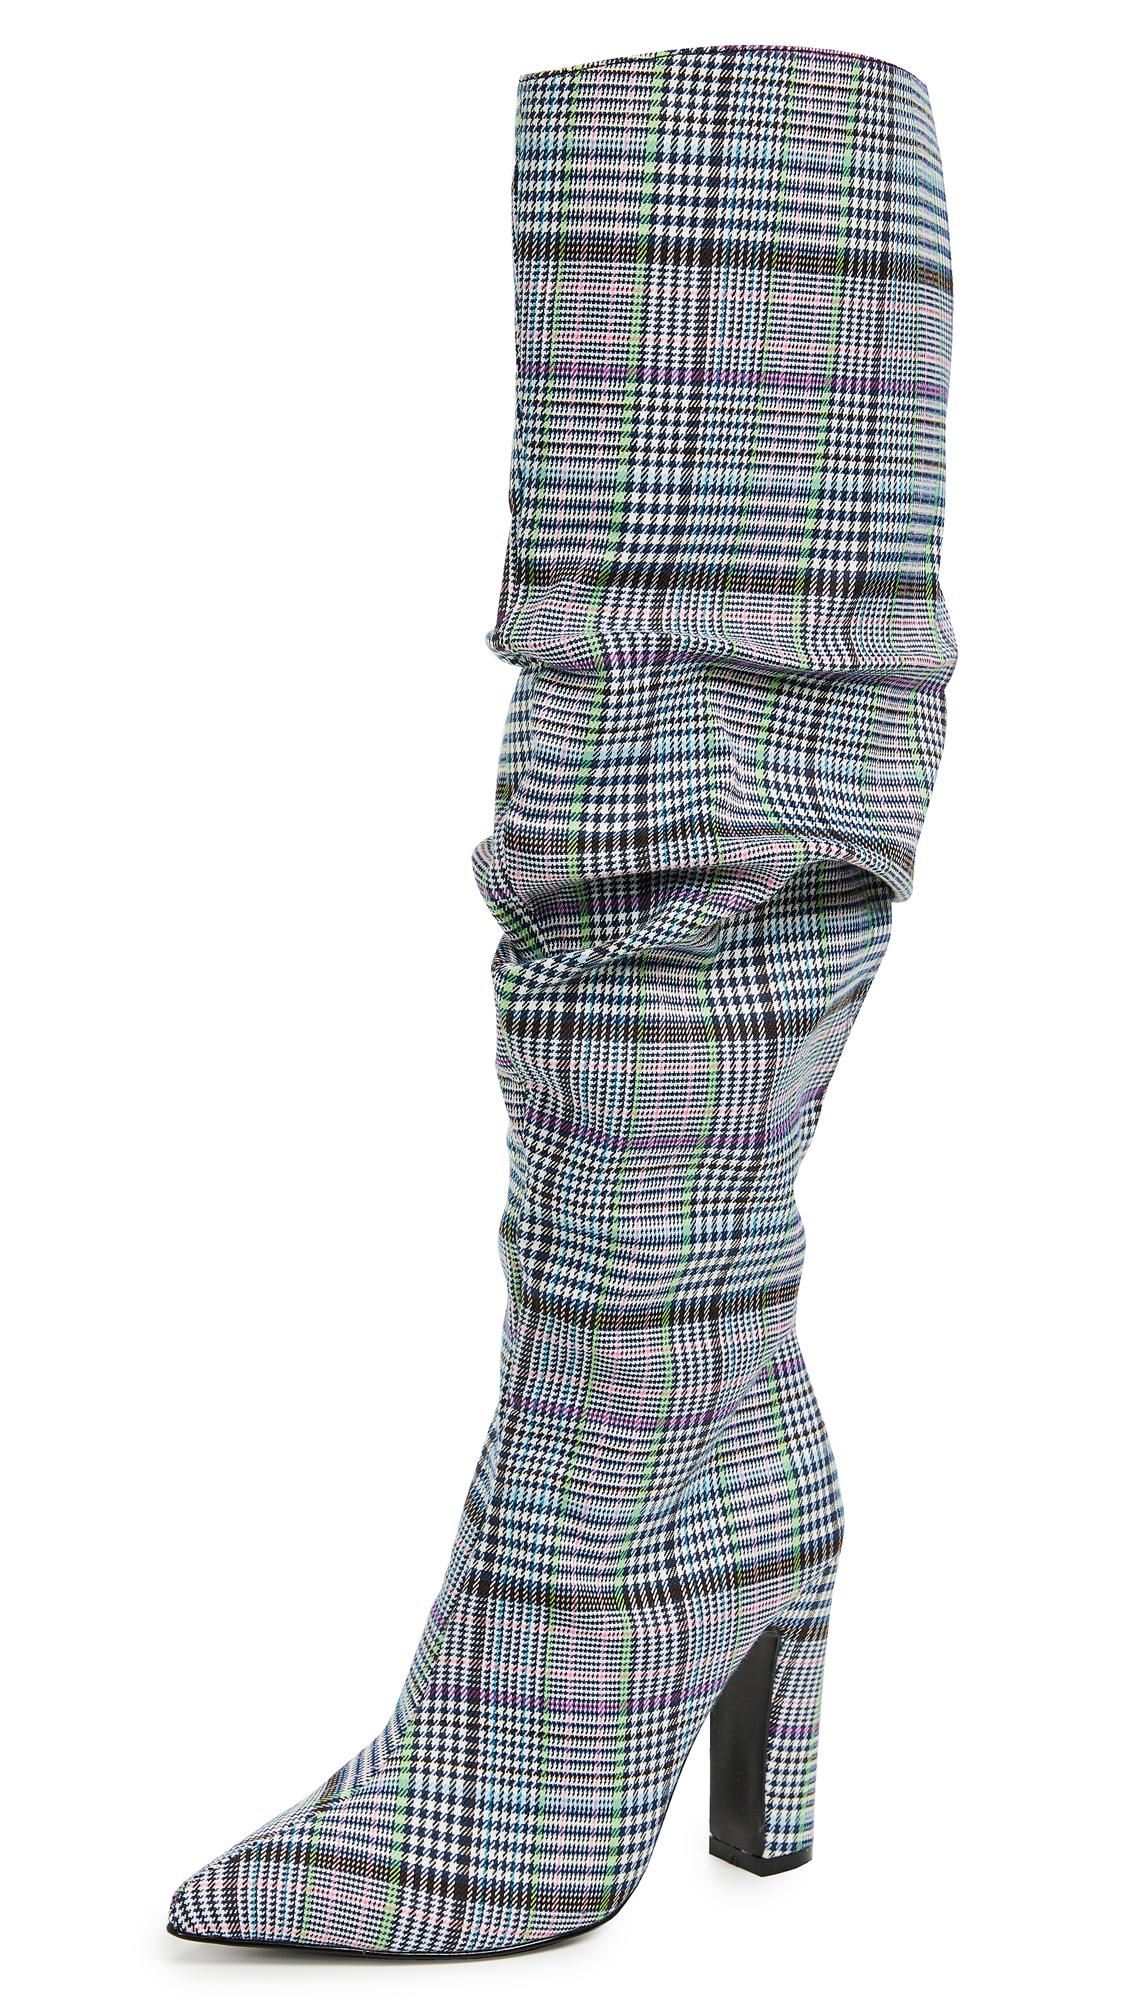 JAGGAR Fortune Check Boots - Multi Check